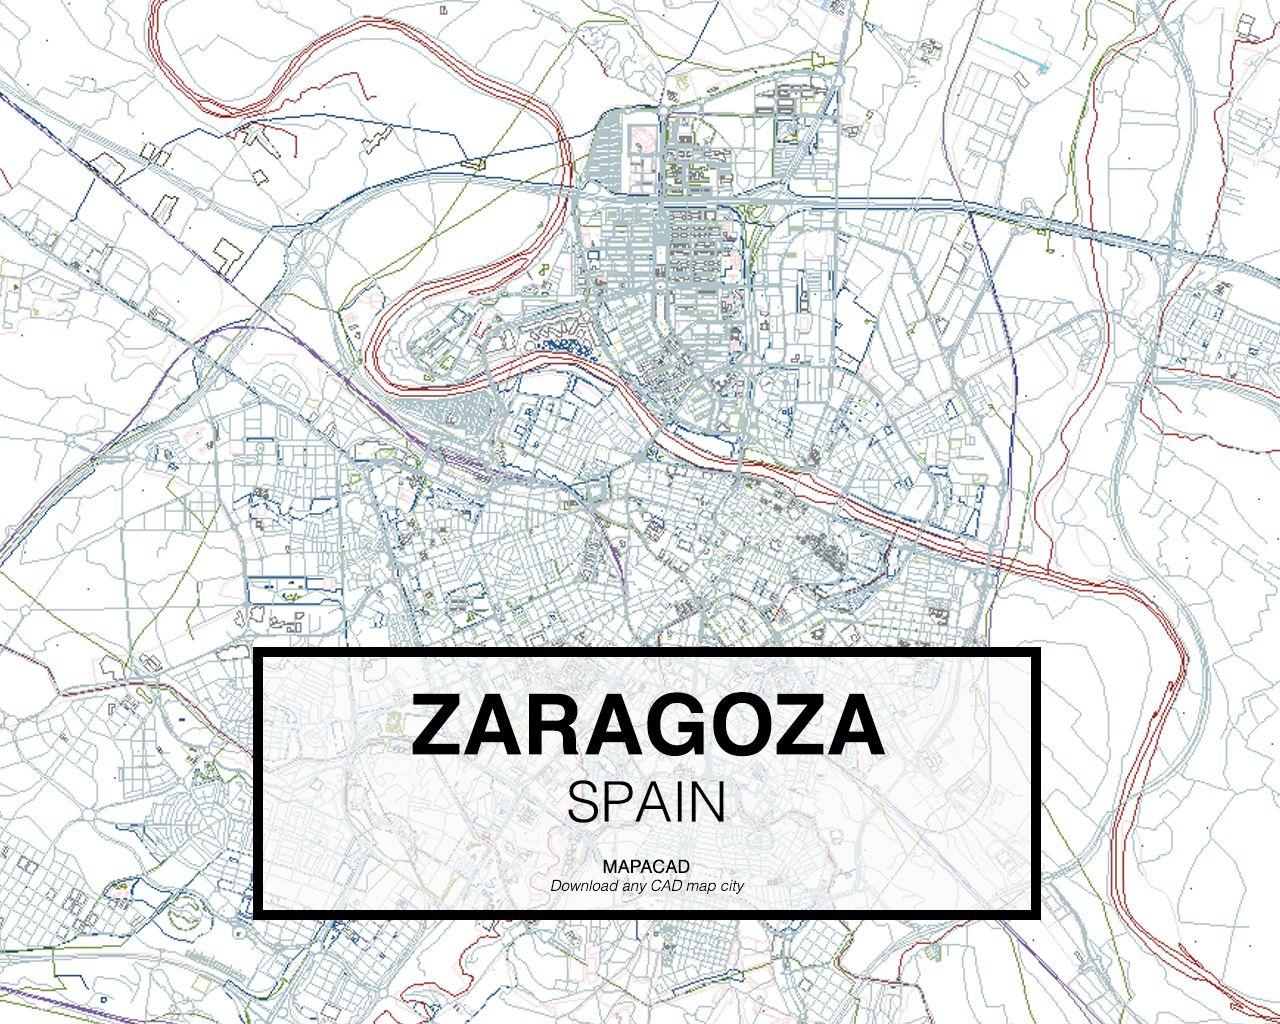 Zaragoza Spain Download Cad Map City In Dwg Ready To Use In  # Muebles Lazaro Zaragoza